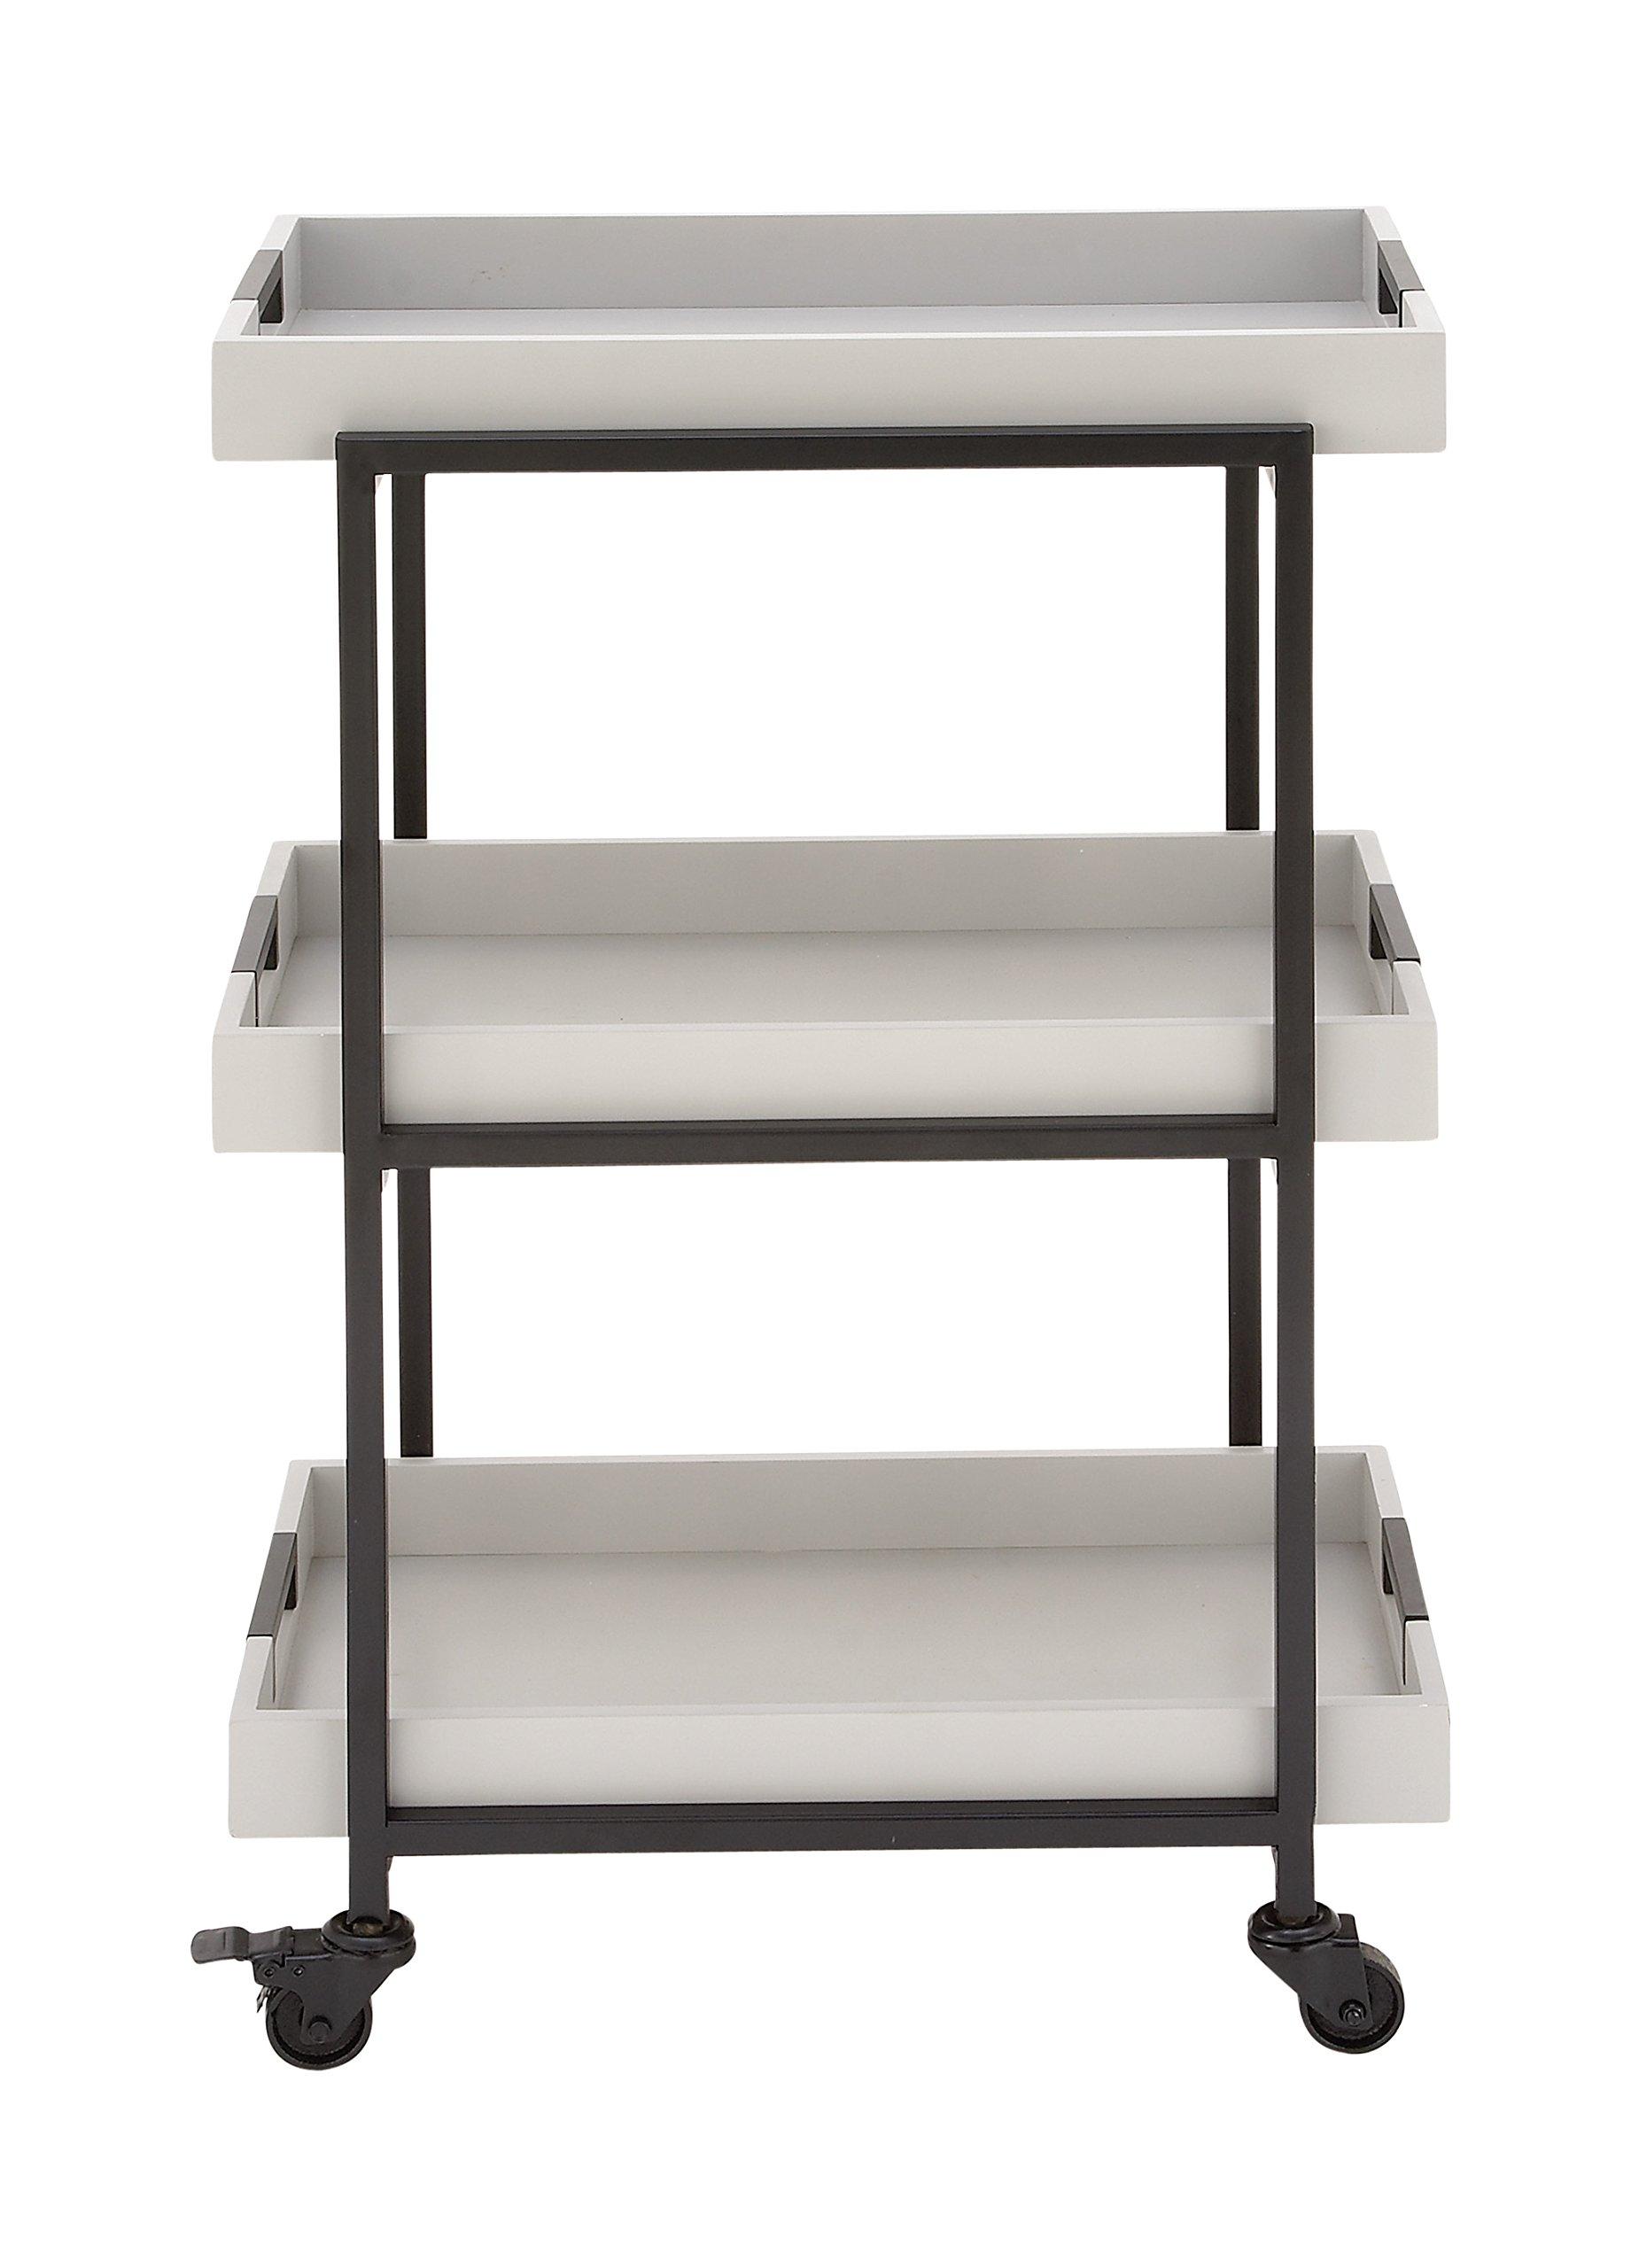 Deco 79 85460 85460 22'' X 34'' Metal Wood Tray Cart,  White/Black